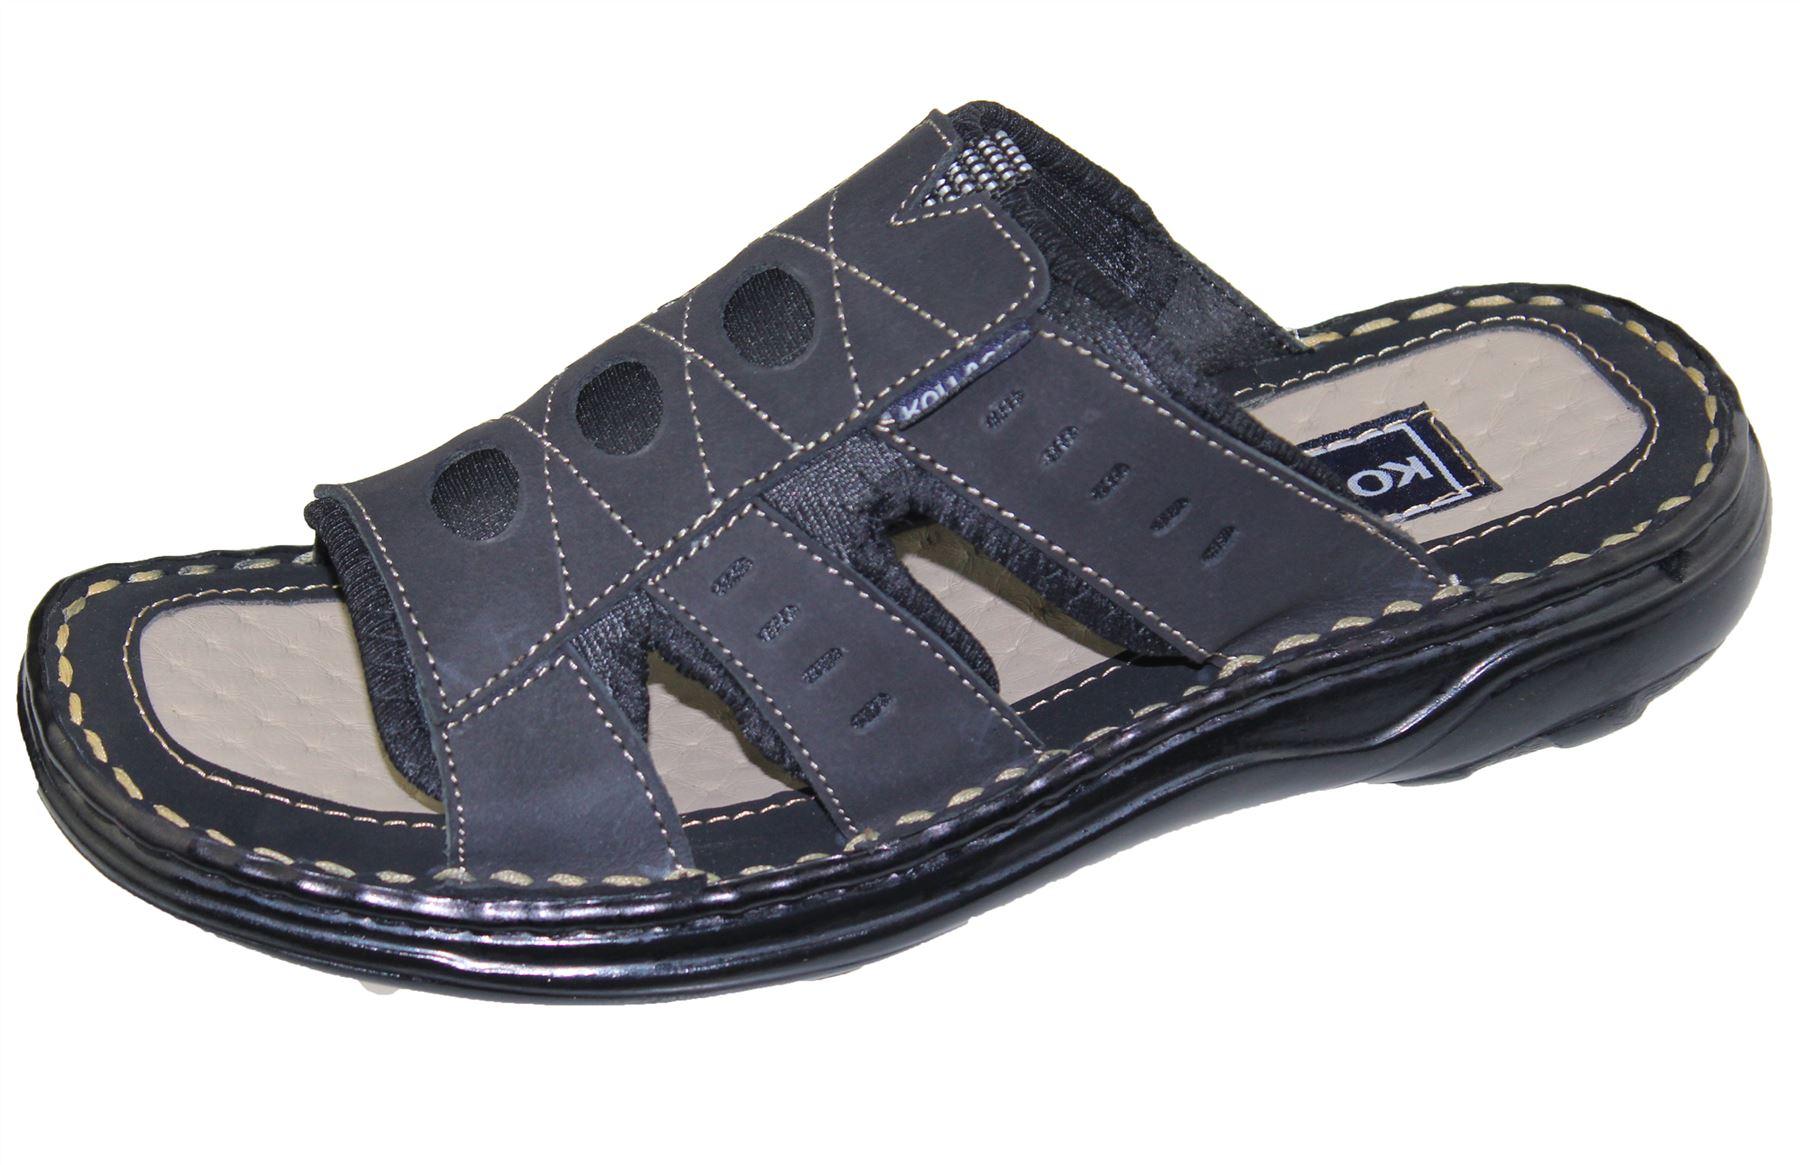 Mens-Slipper-Sandal-Sports-Beach-Buckle-Walking-Fashion-Summer-Casual-Shoes-Size miniatura 6